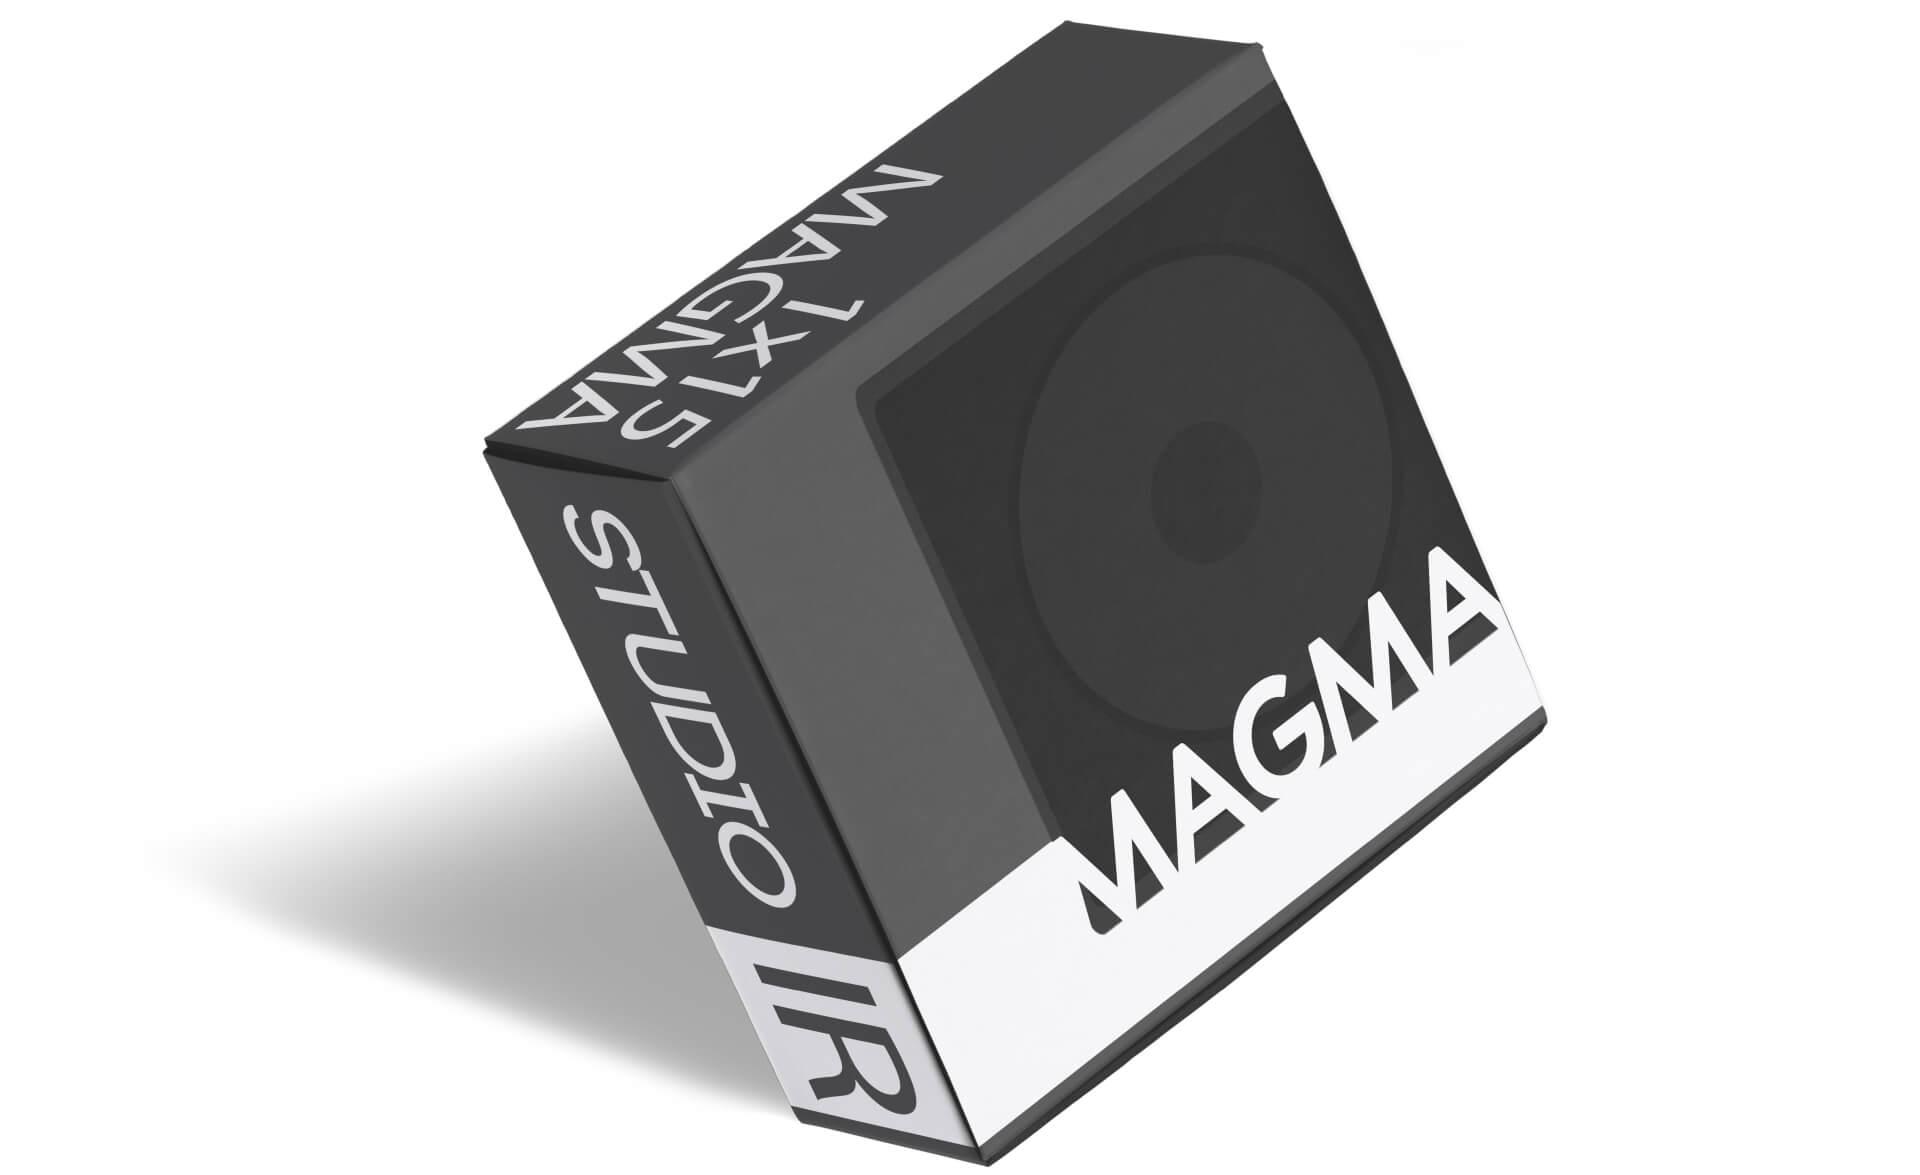 Studio Magma Plauen